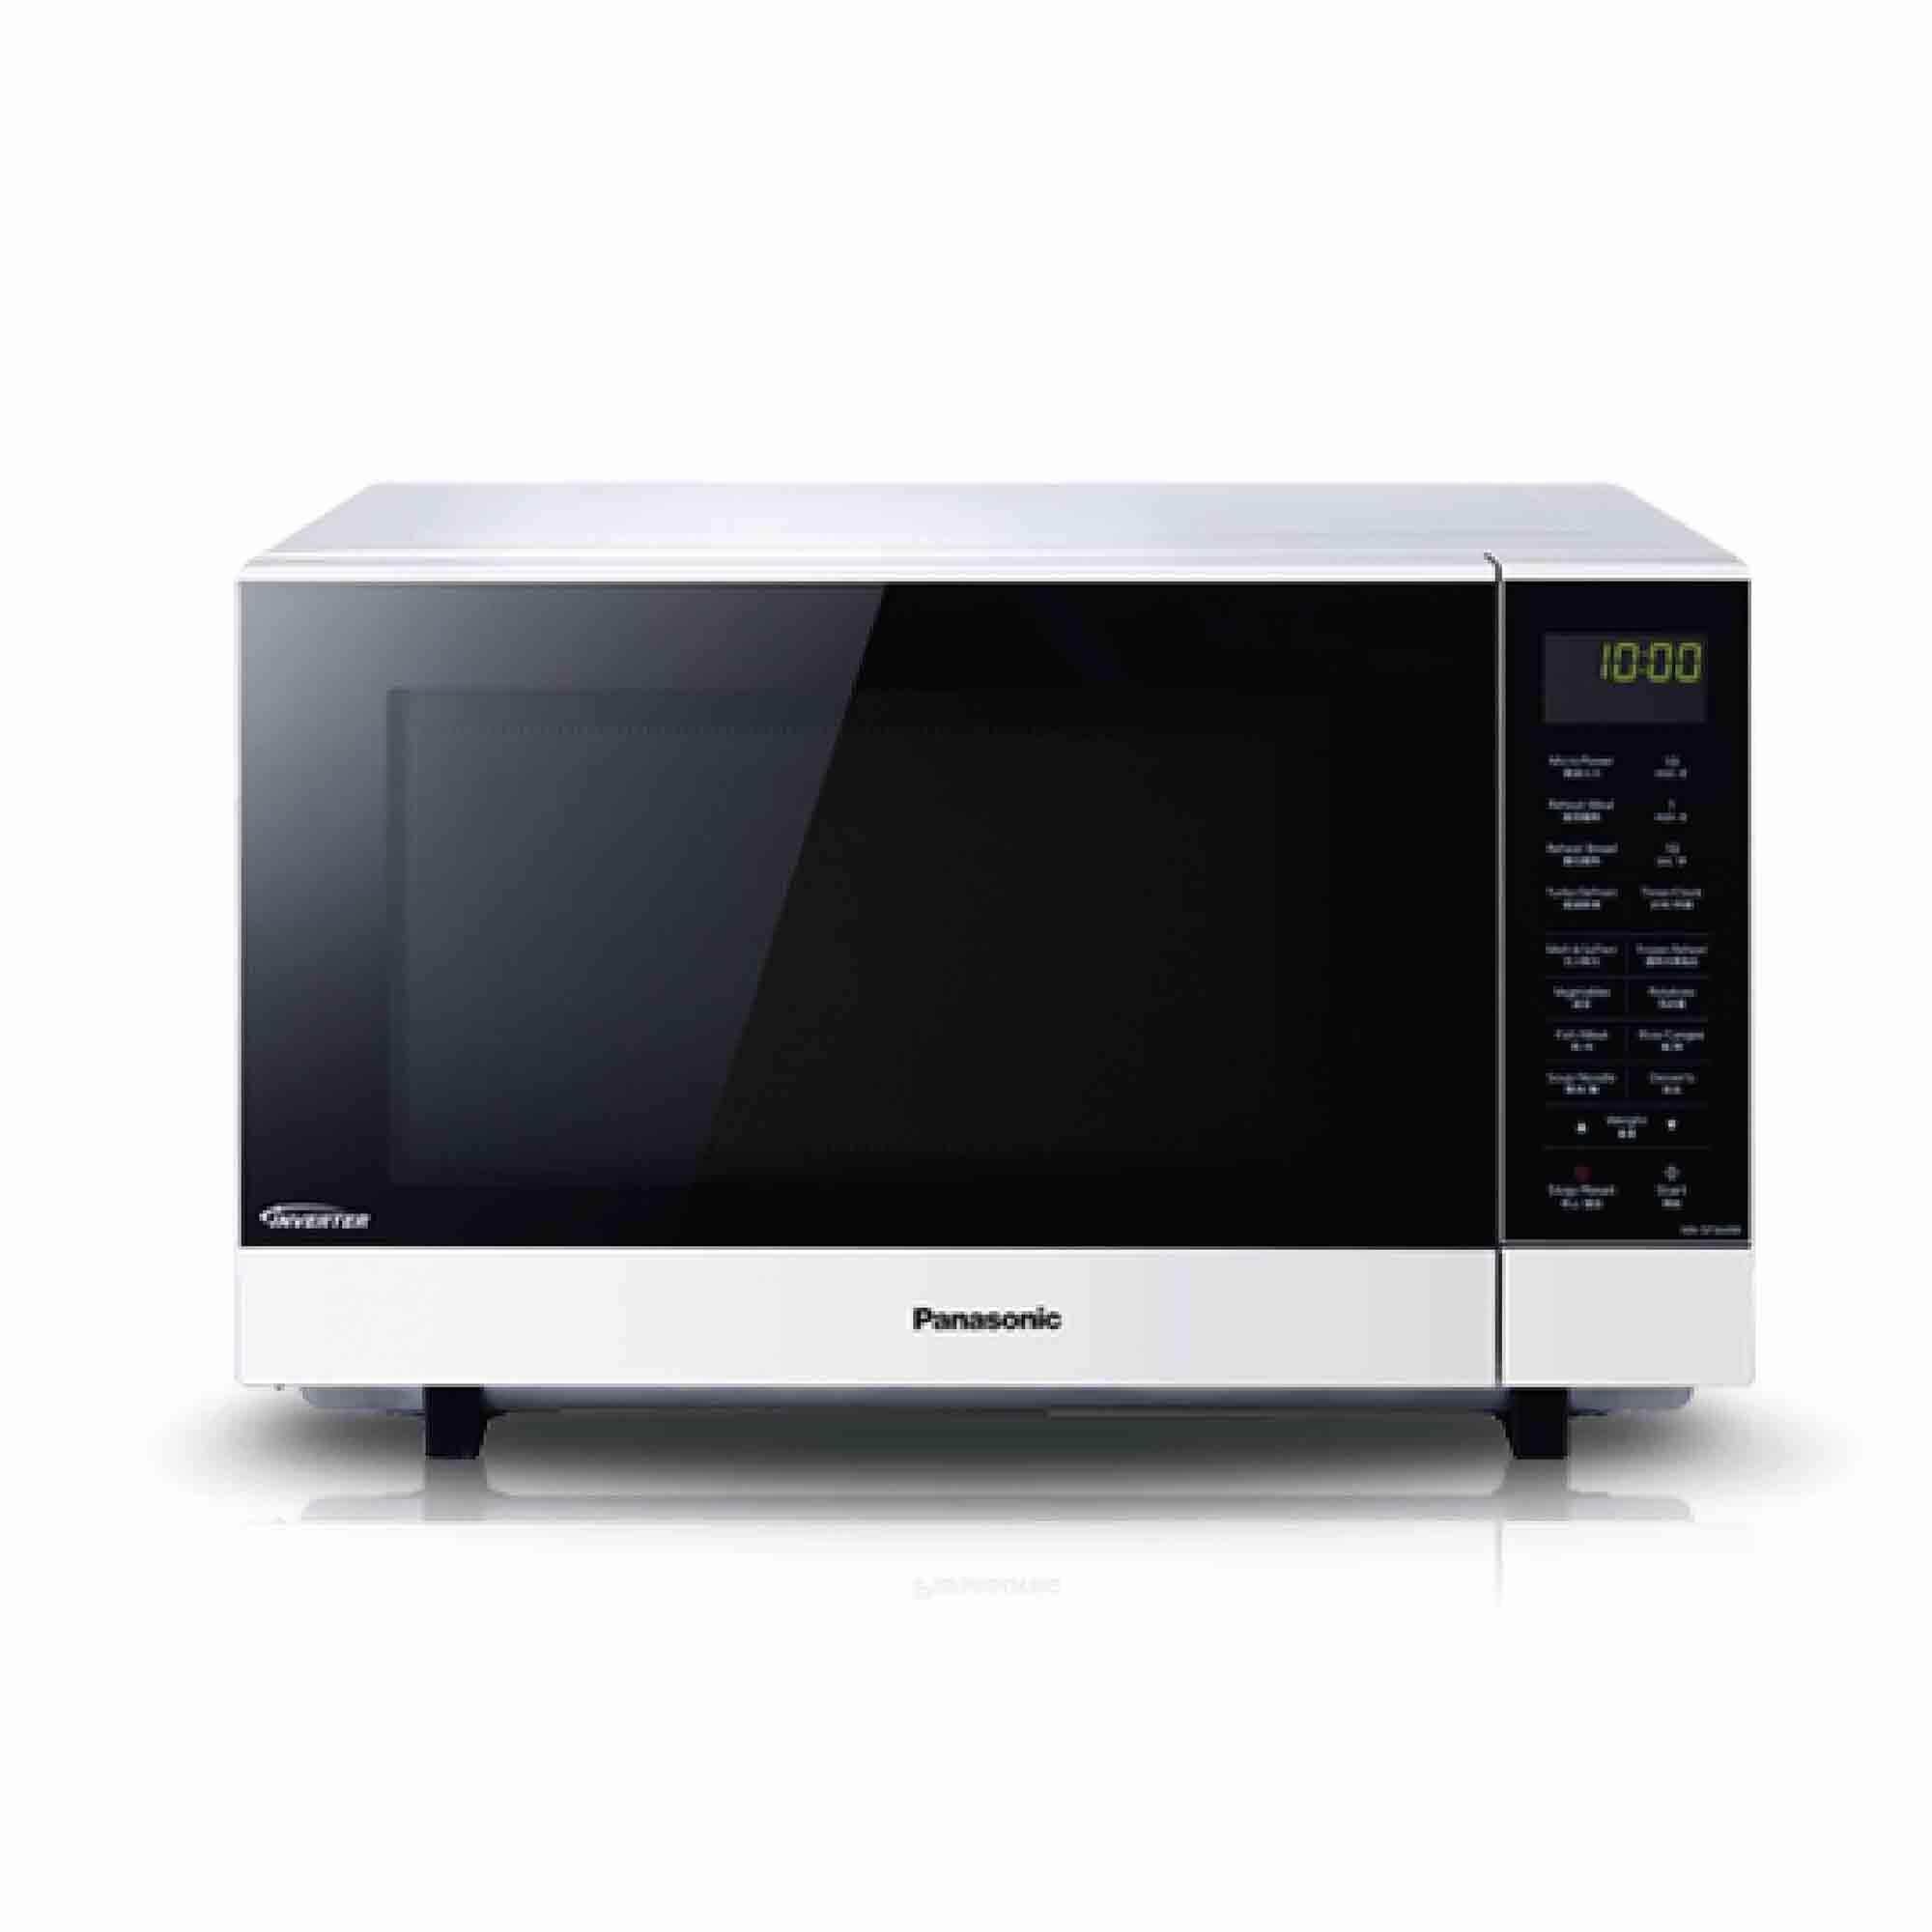 Panasonic Microwave Oven NN-SF564W (27L) Flat & Wide Cavity